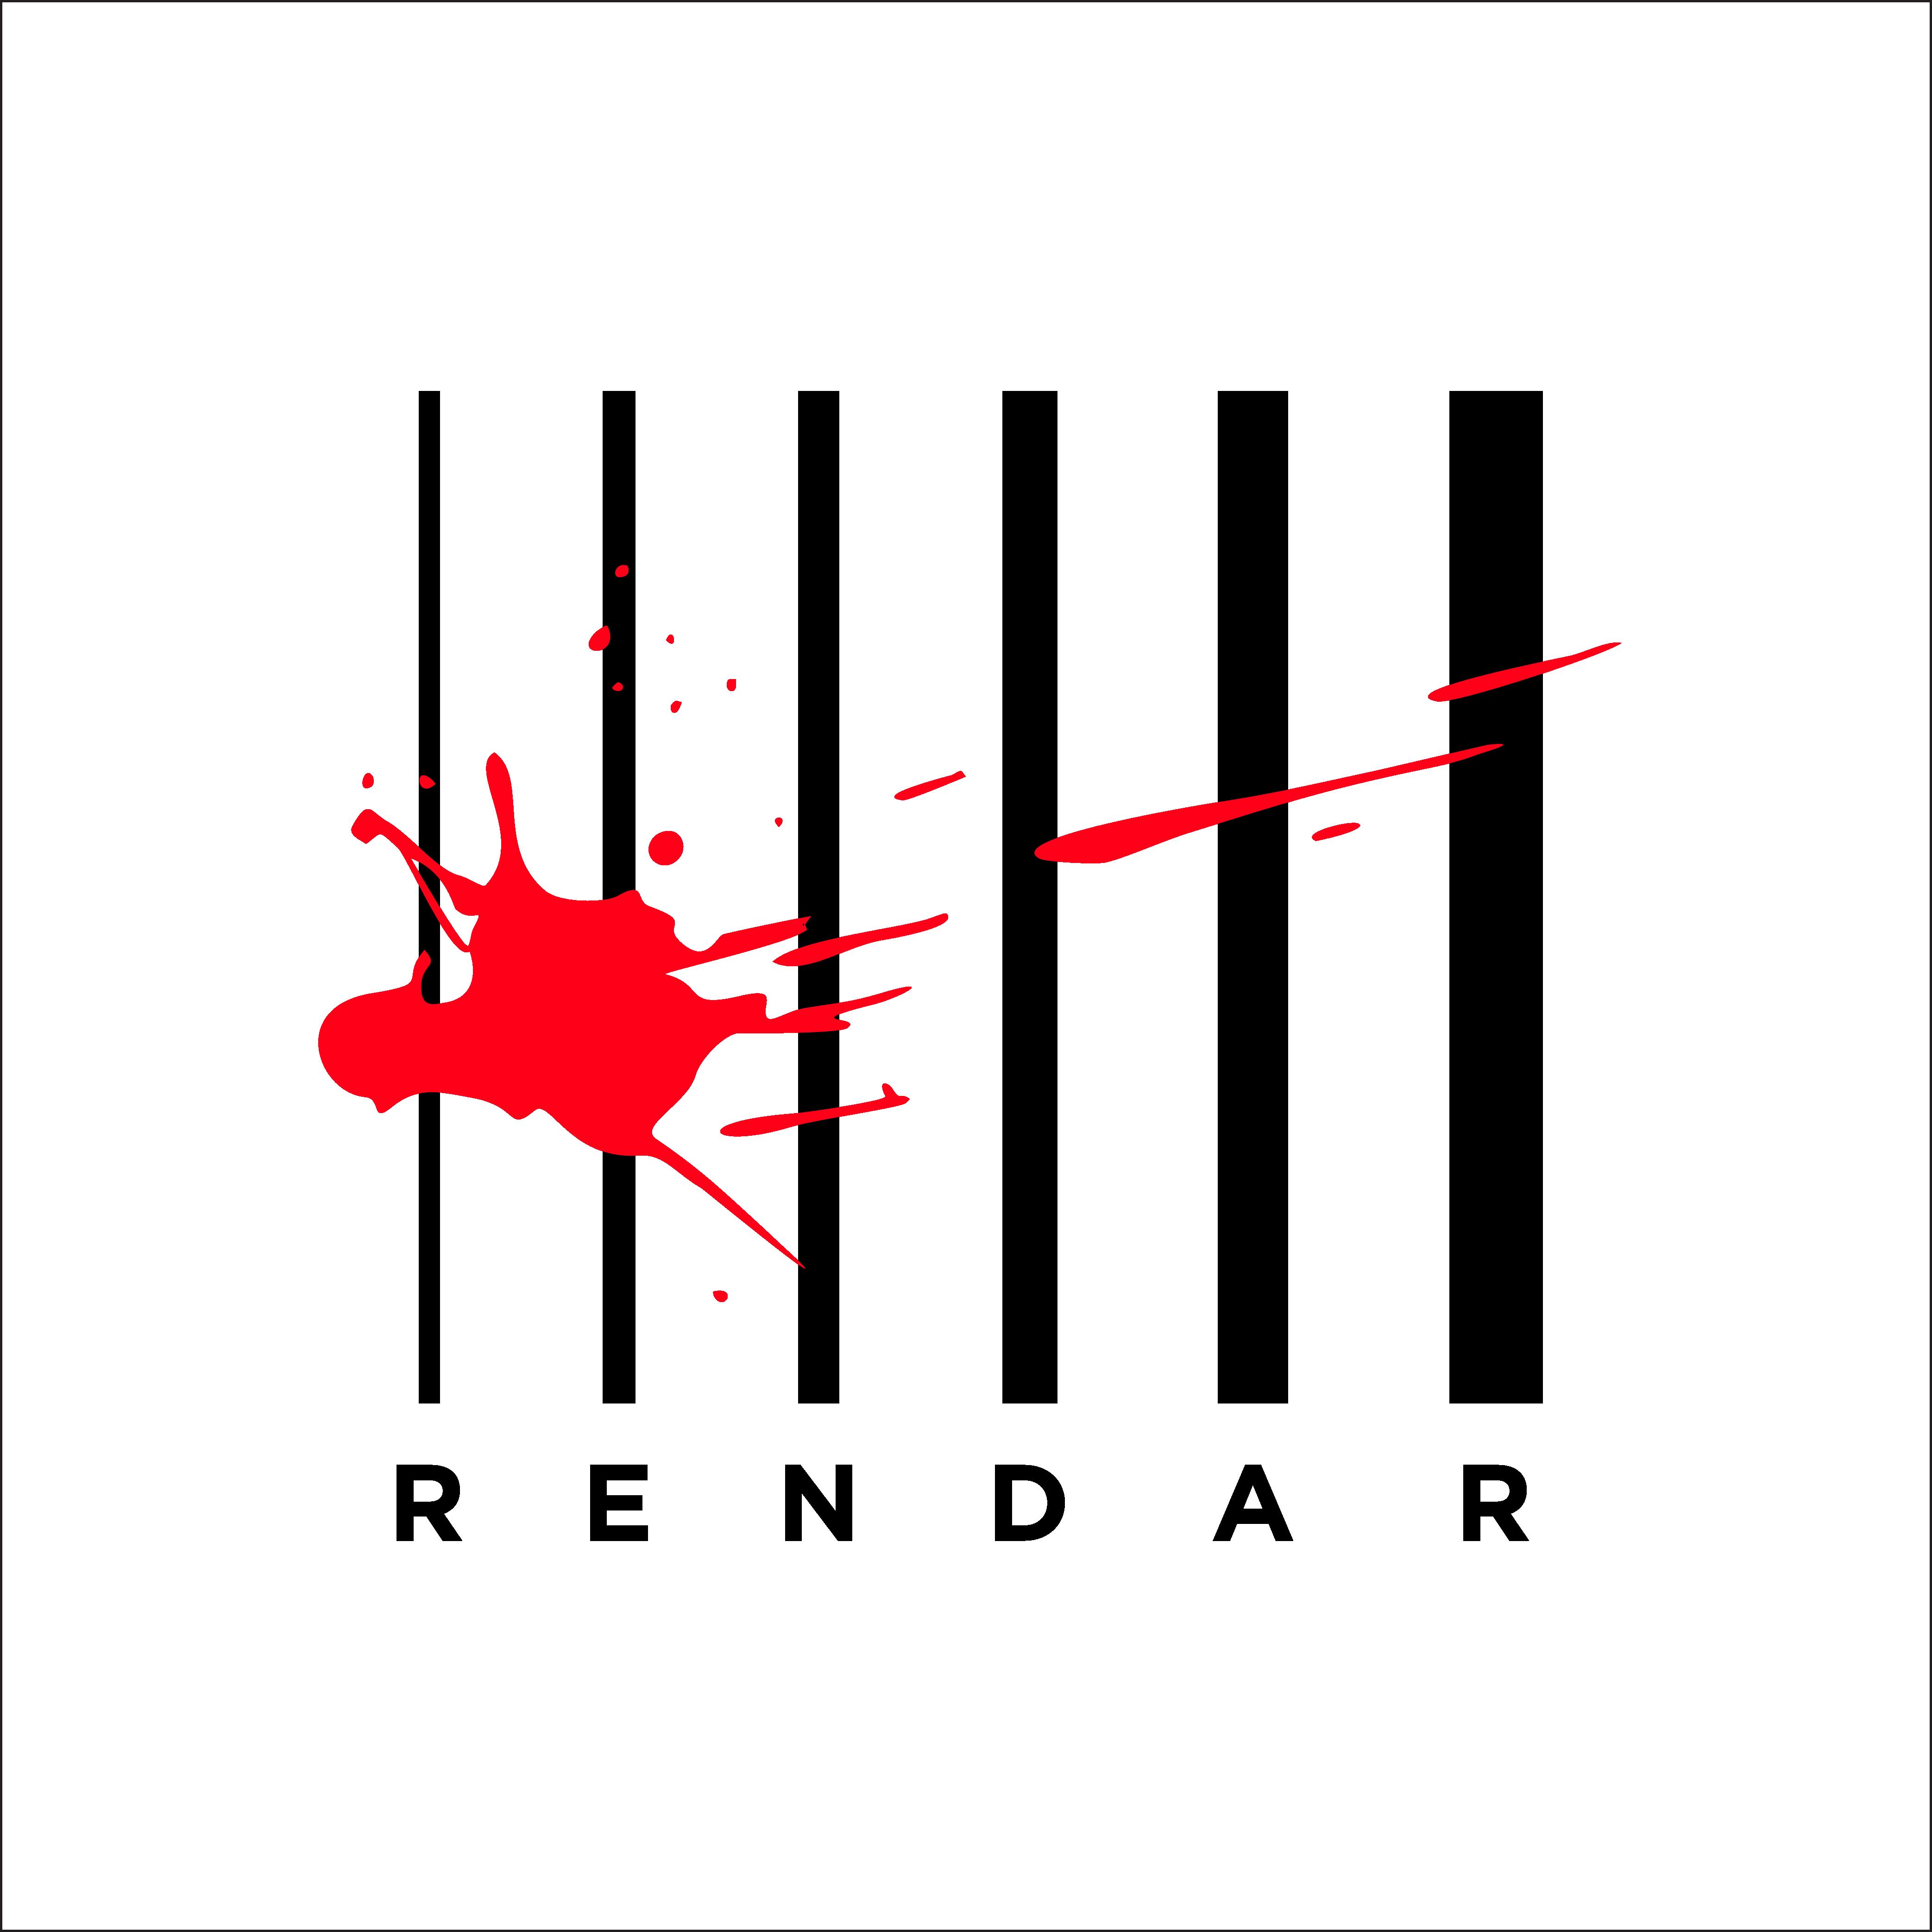 Digital art gallery needs iconic logo